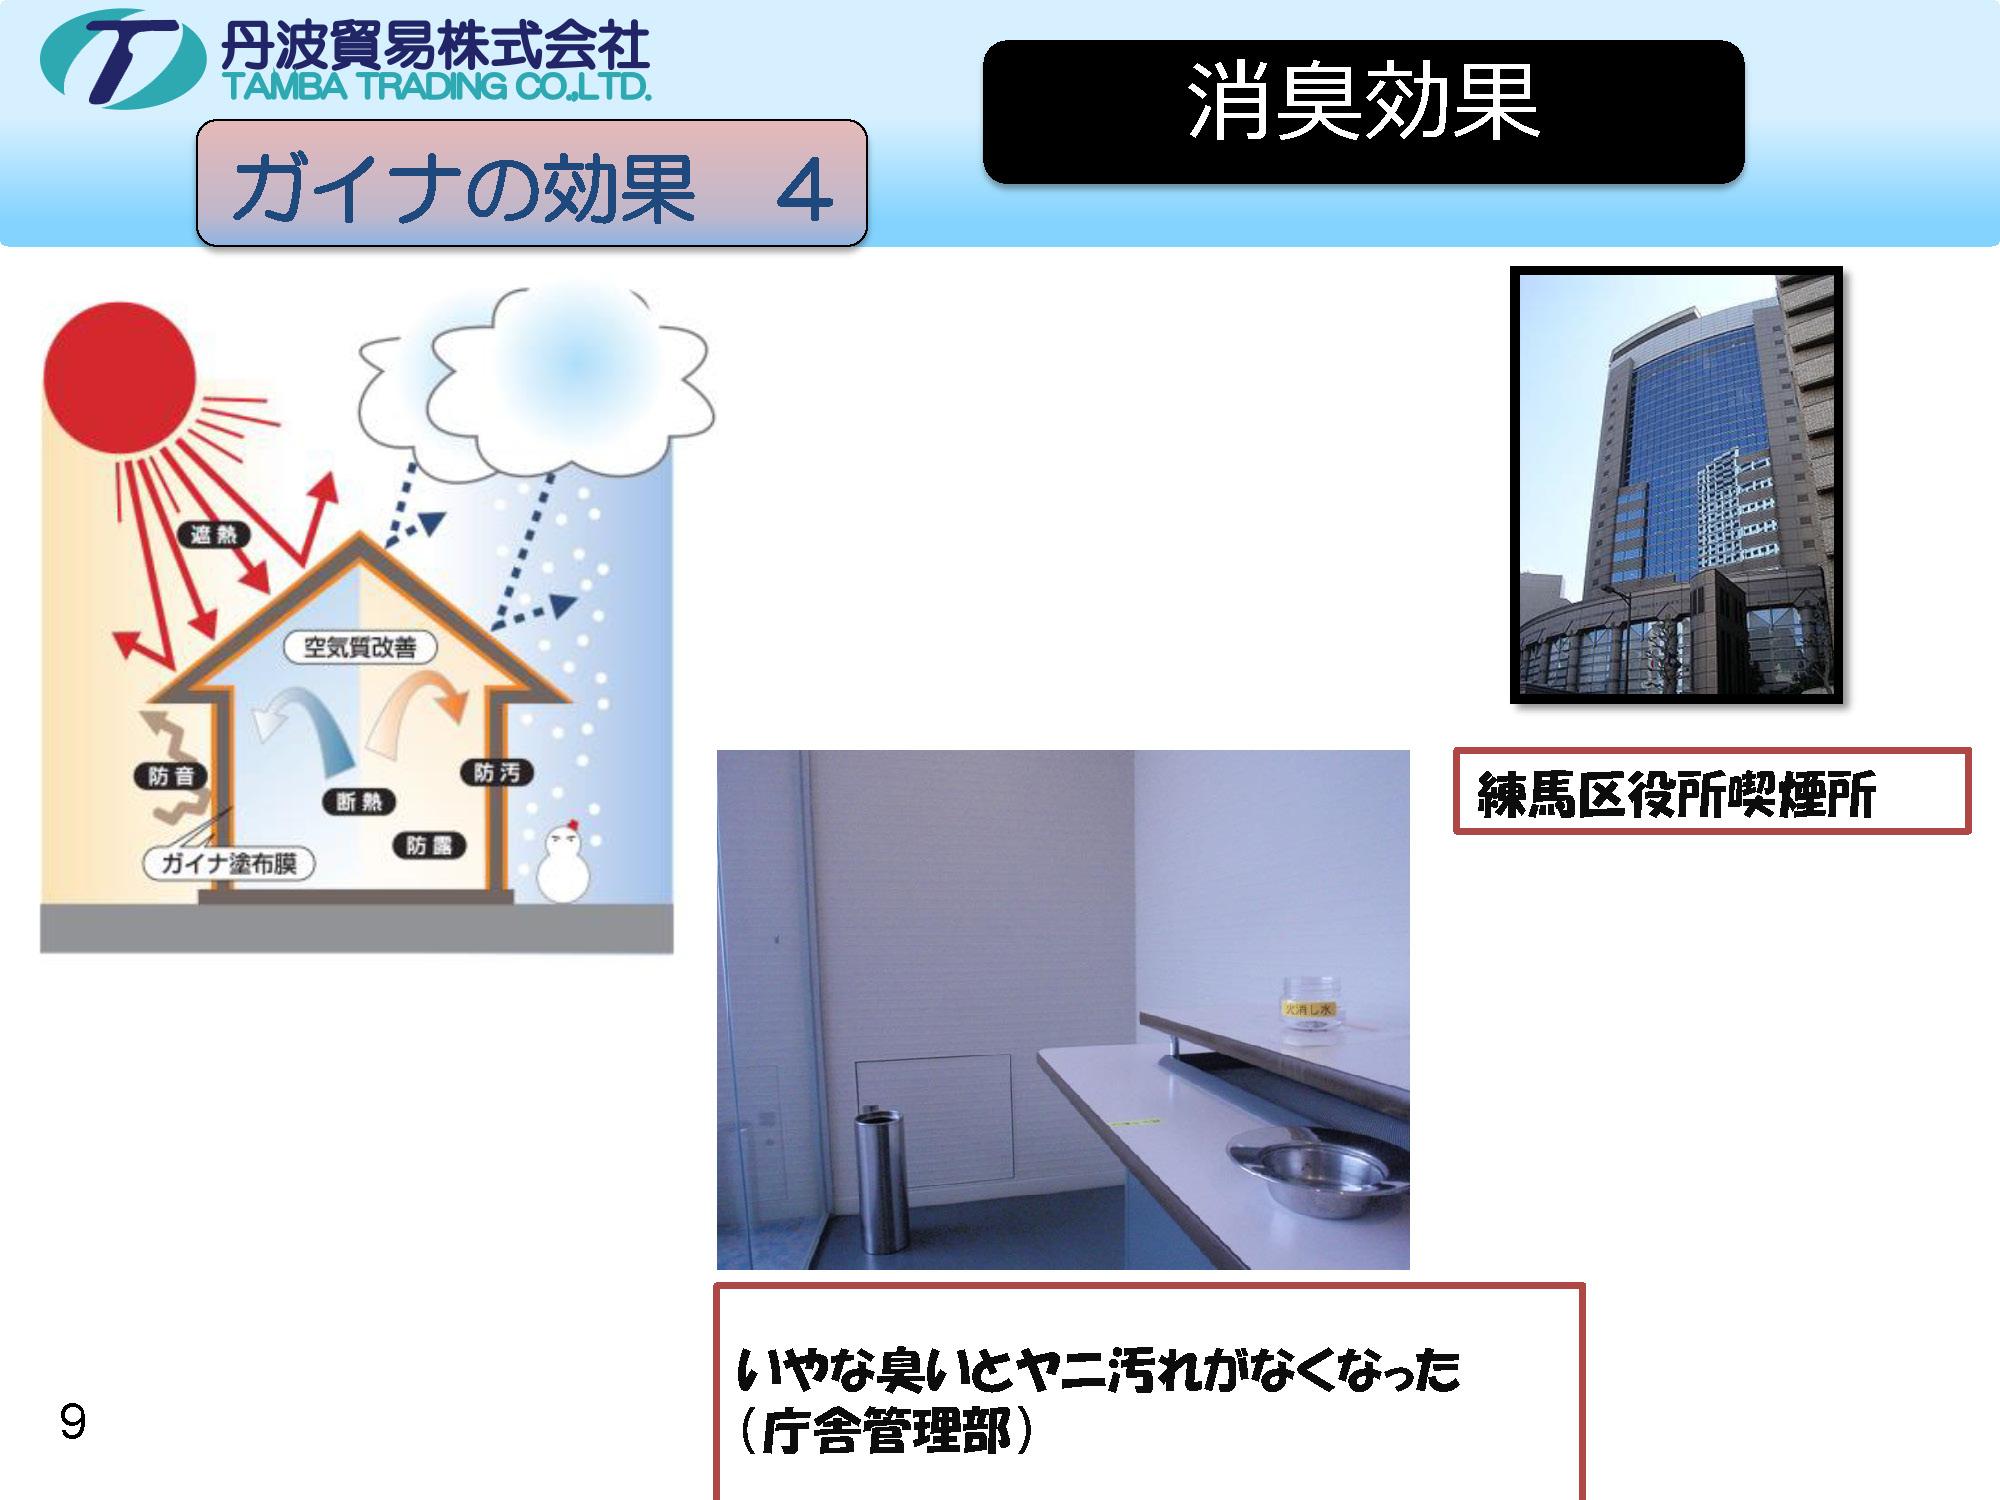 ガイナ紹介_丹波貿易_頁面_09